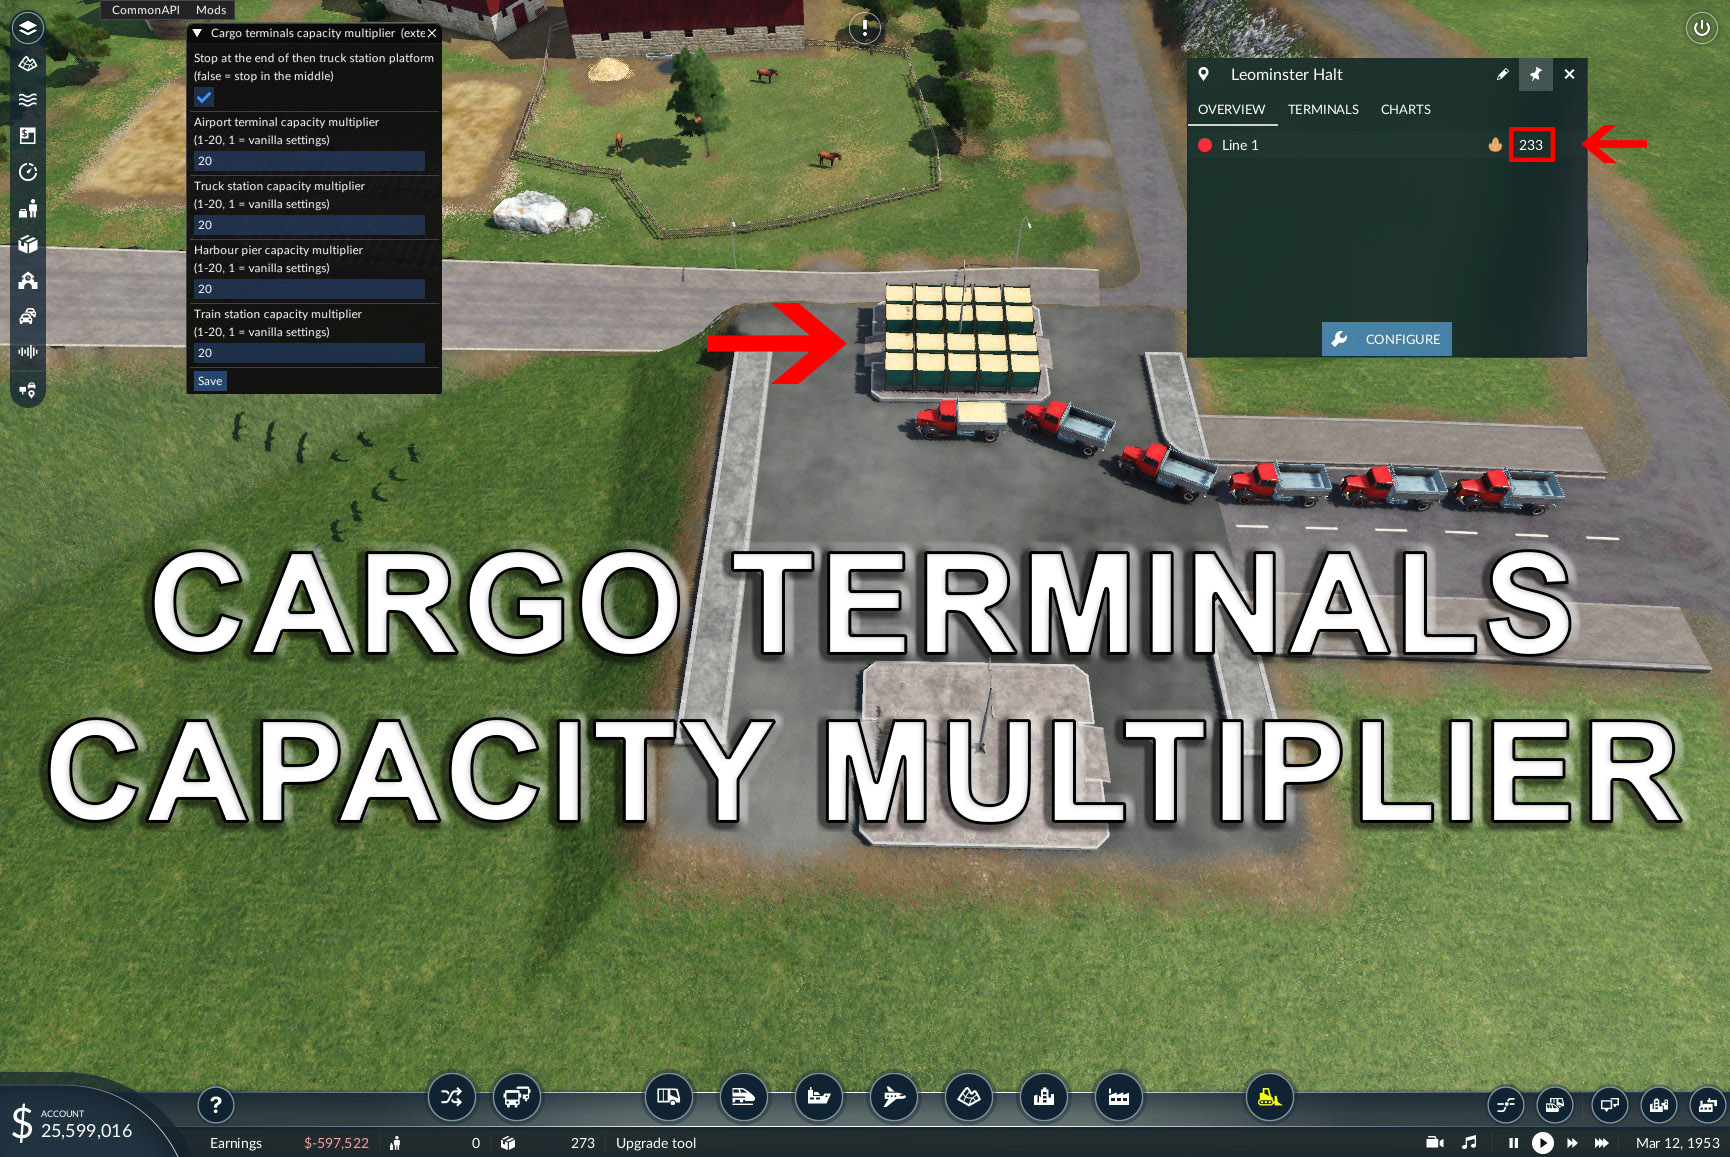 Transport Fever 2 - Cargo Terminals Capacity Multiplier